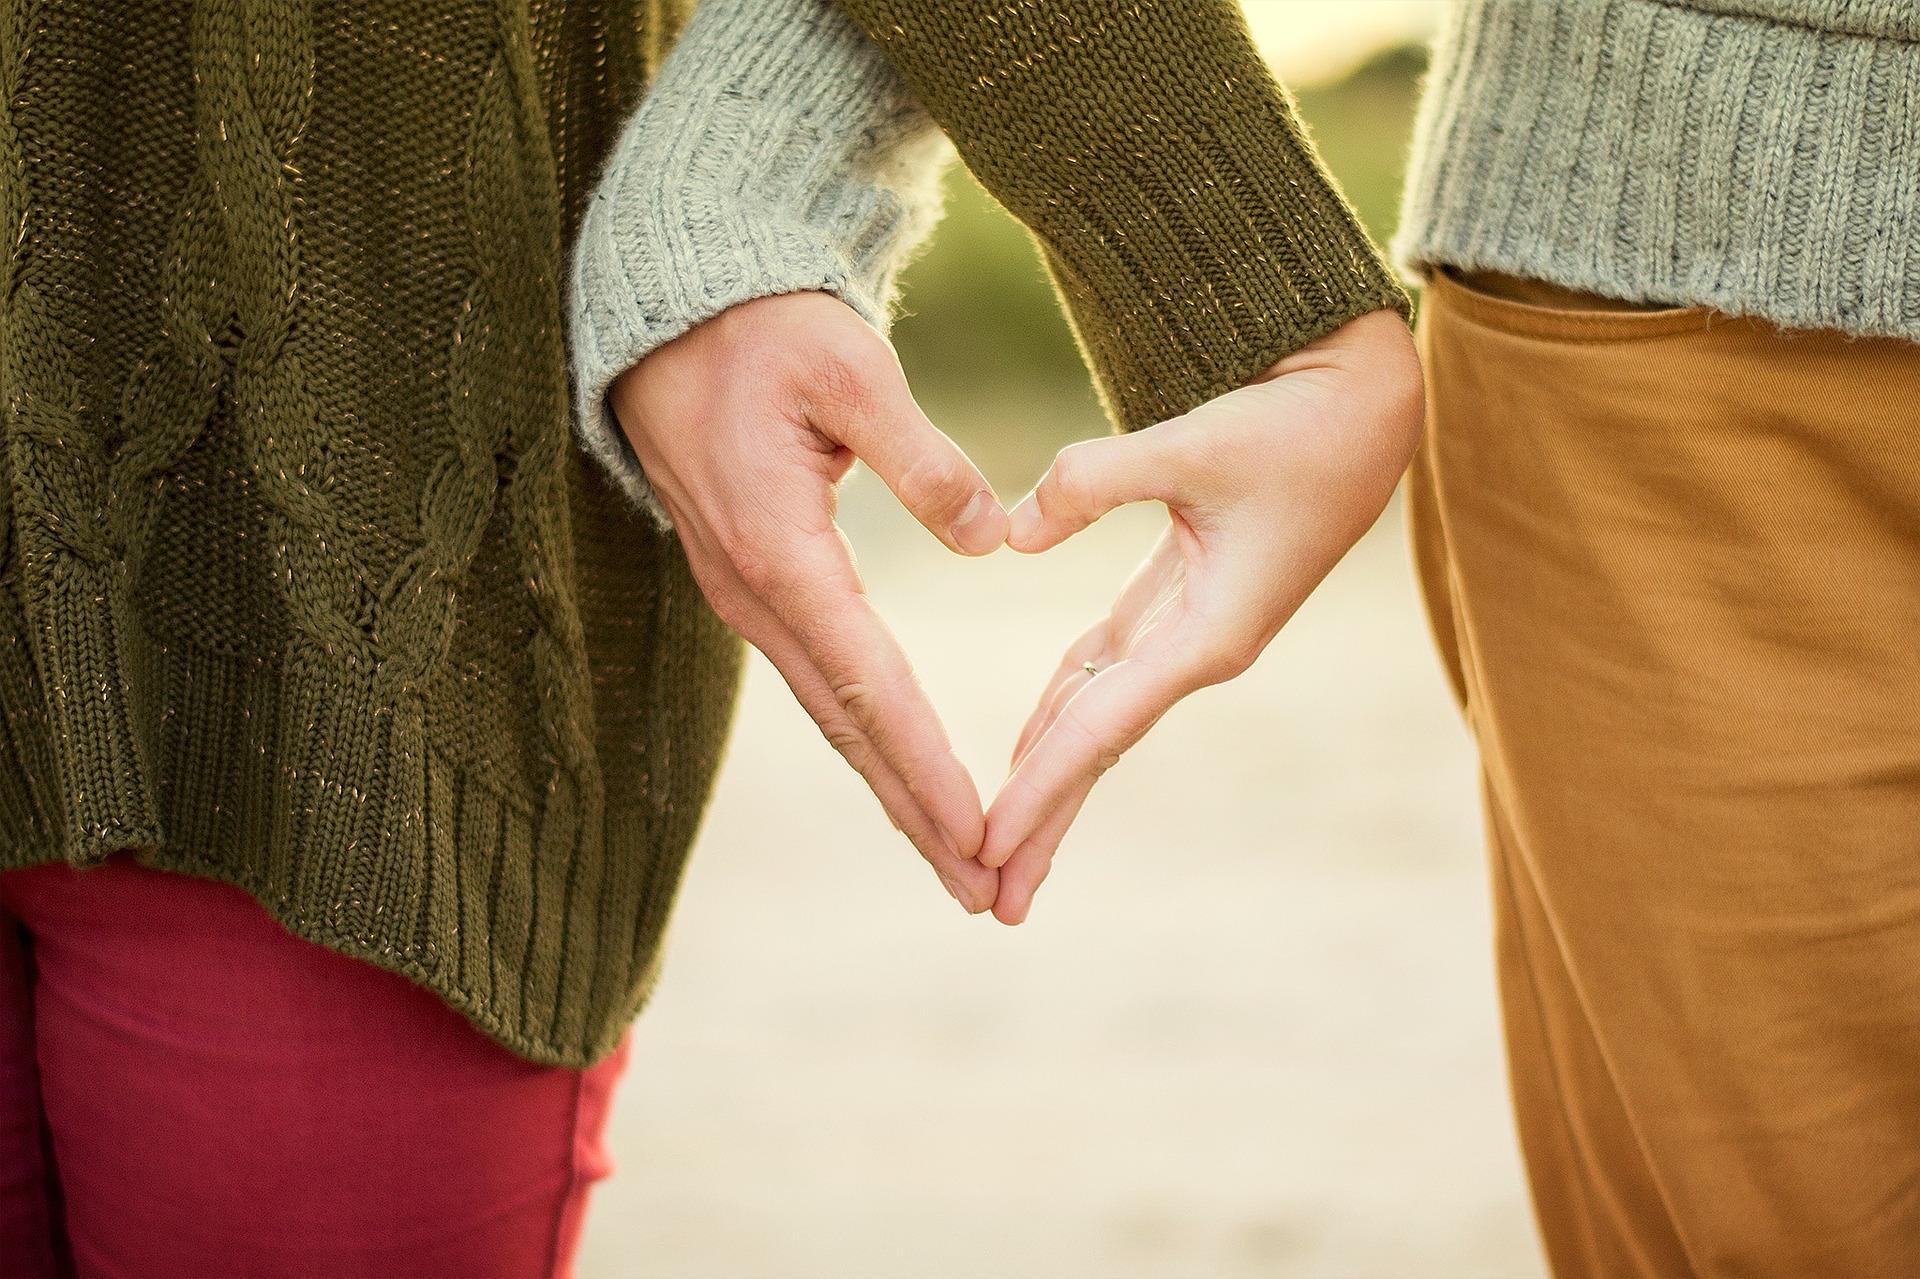 Inpatient Drug Rehab Enid, OK Addiction Treatment Couple Rehabs